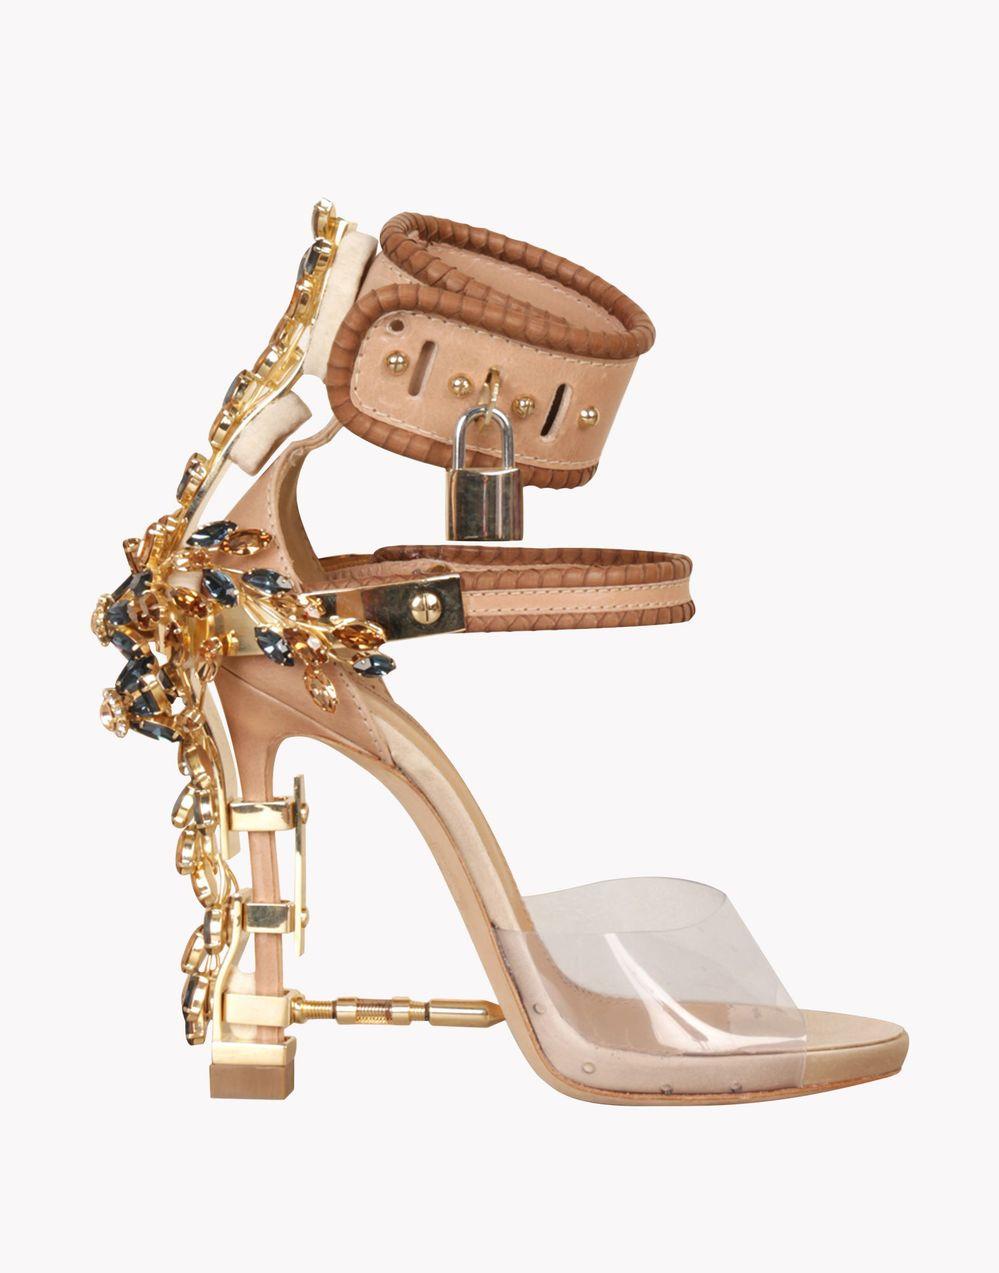 Luxury Jewel Embellished High Heel Sandal Ankle Strappy Locked Up